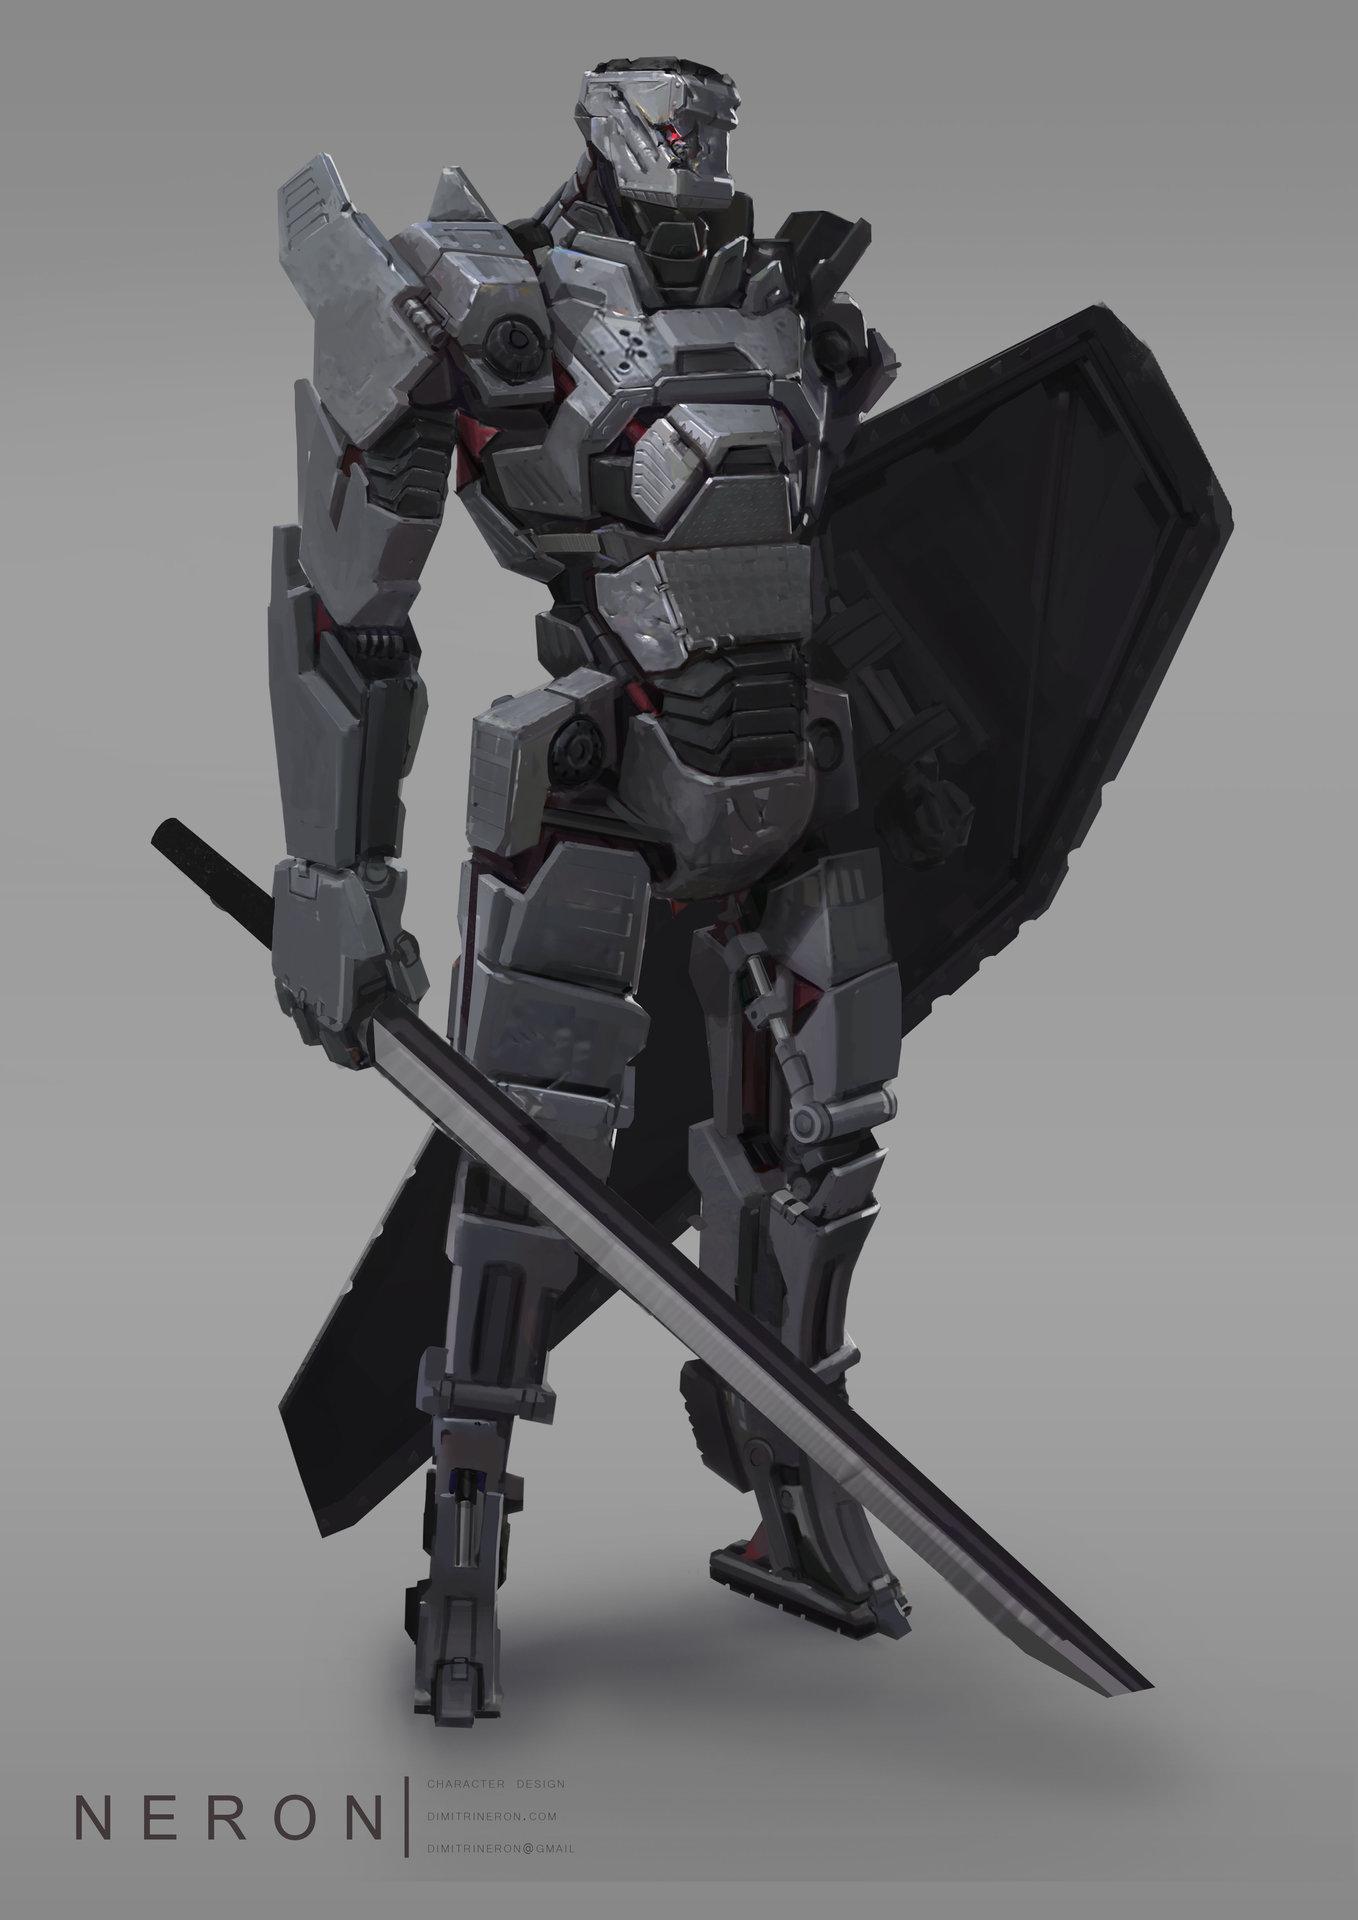 dimitri-neron-rrrrobot